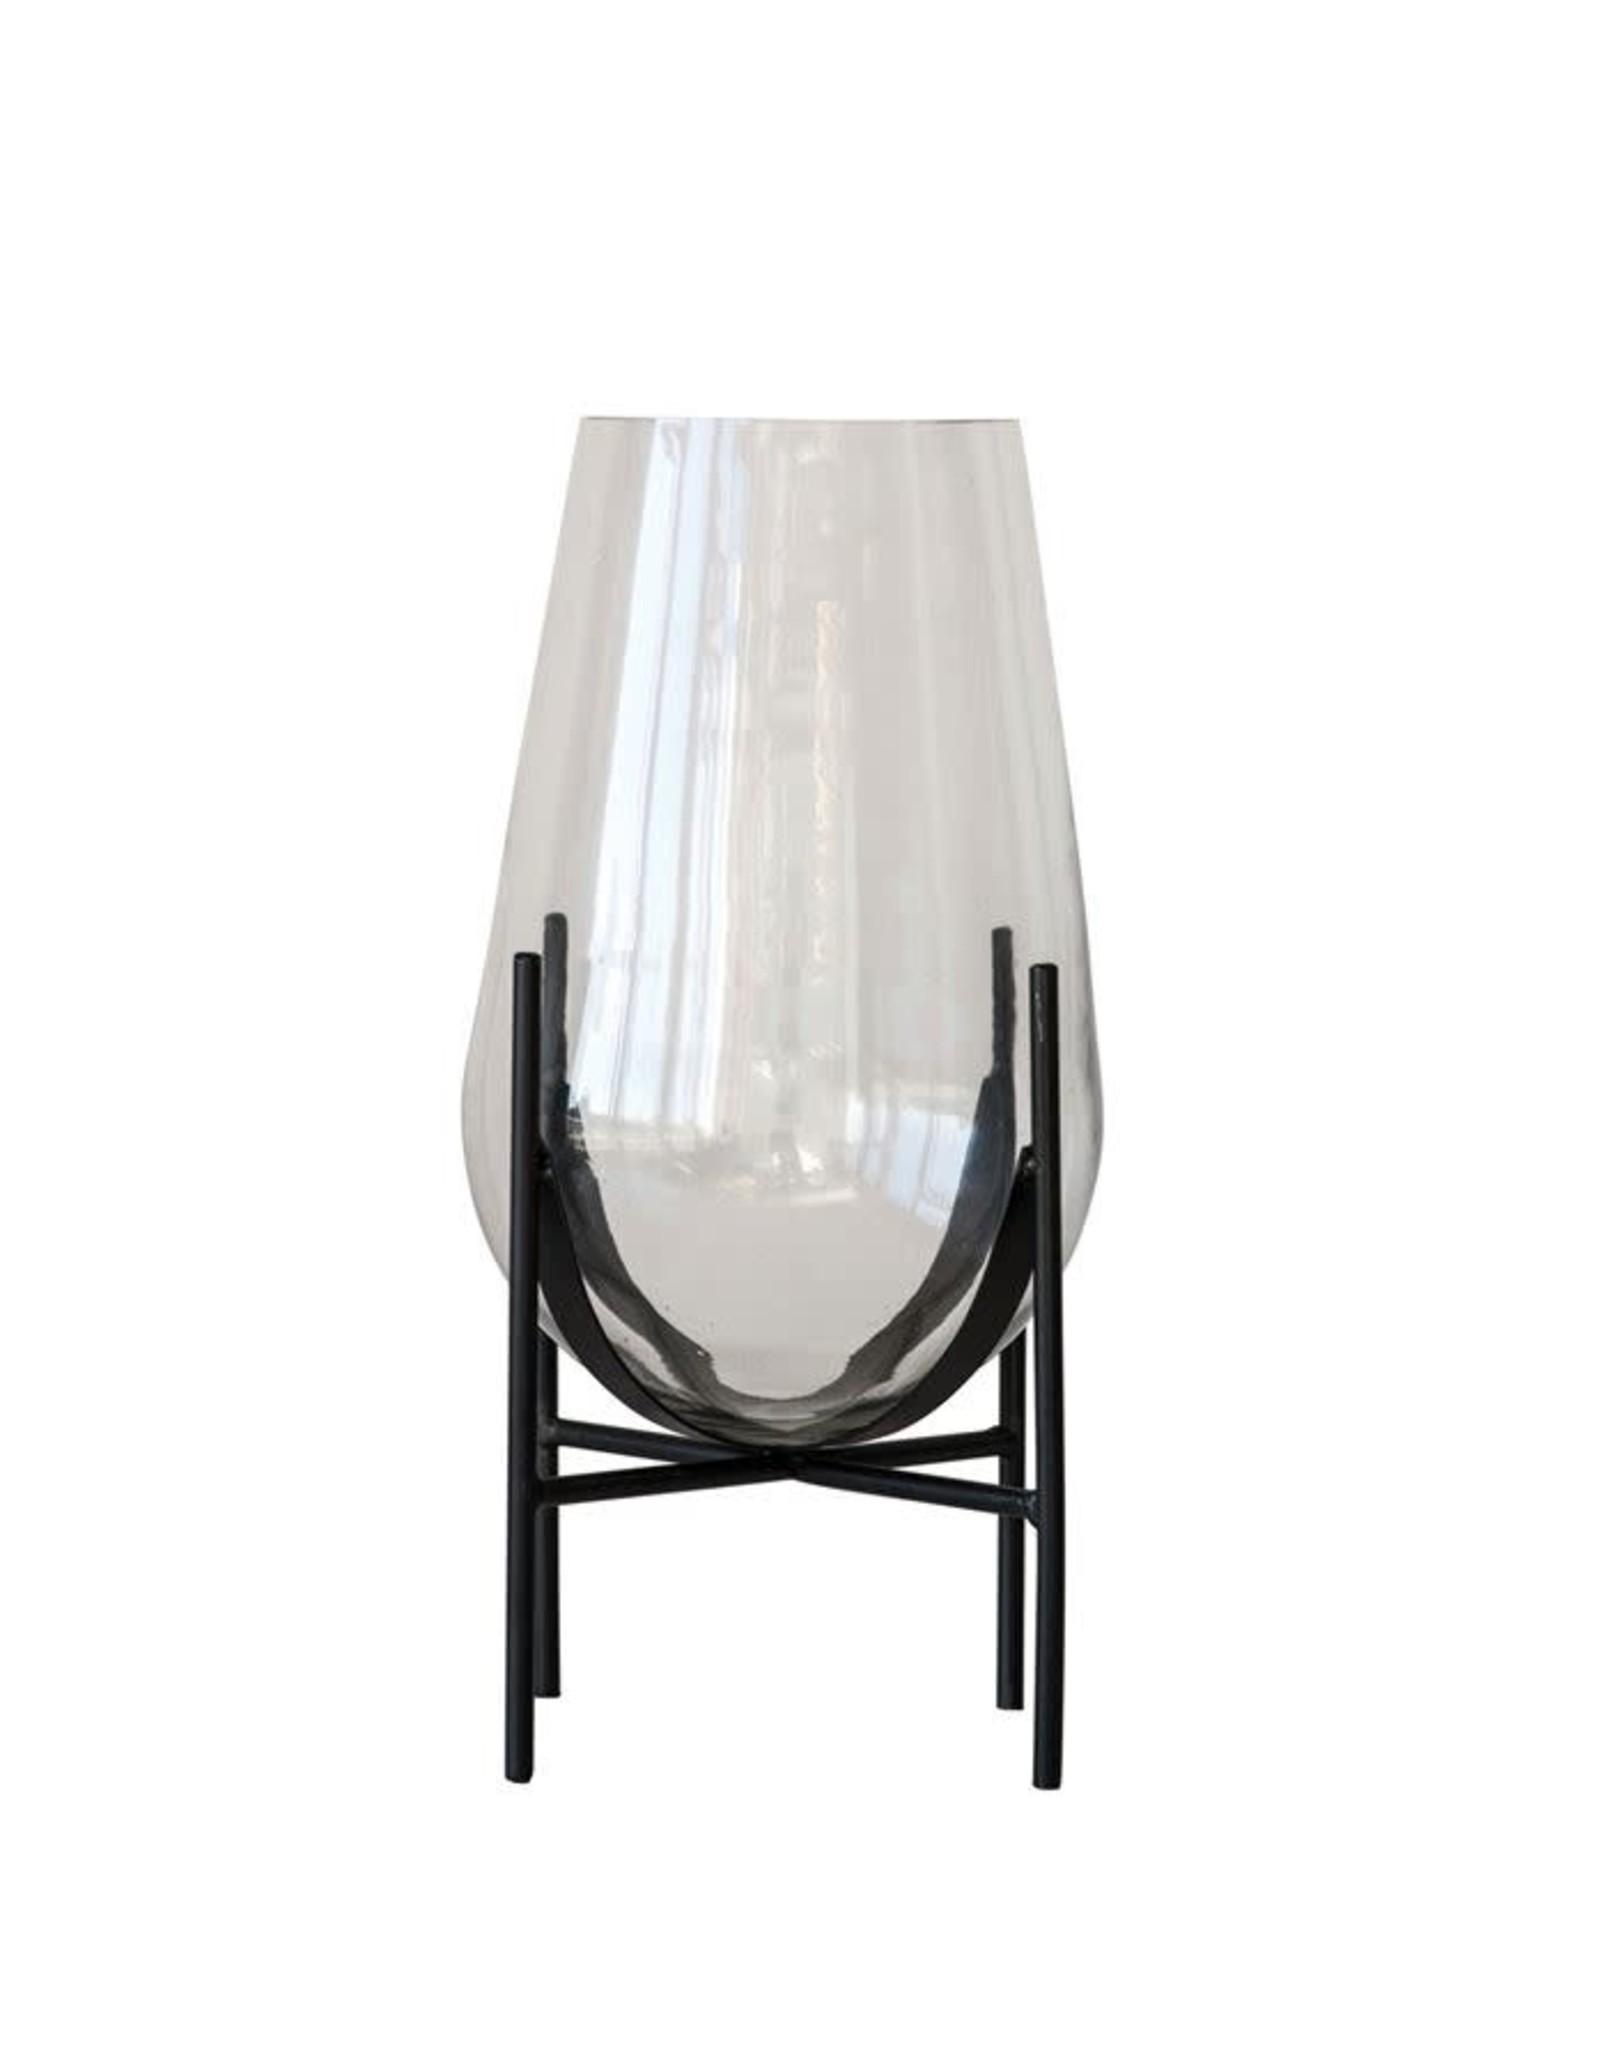 "Bloomingville 15 3/4"" H Glass Vase w/ Metal Stand"